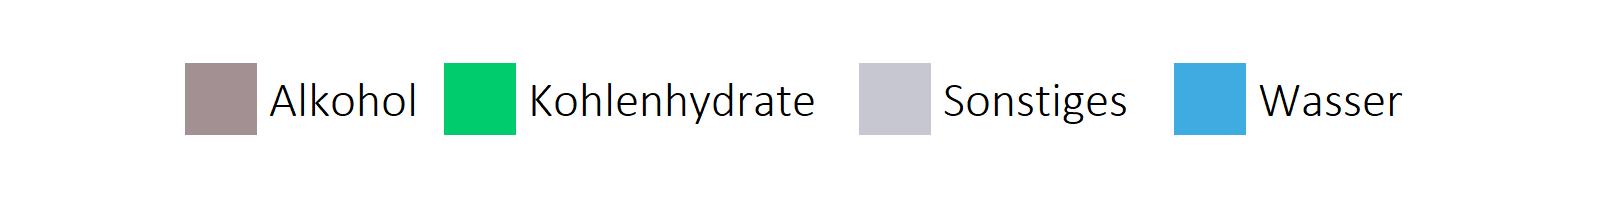 alkoholhaltige Getränke Bestandteile horizontale Legende